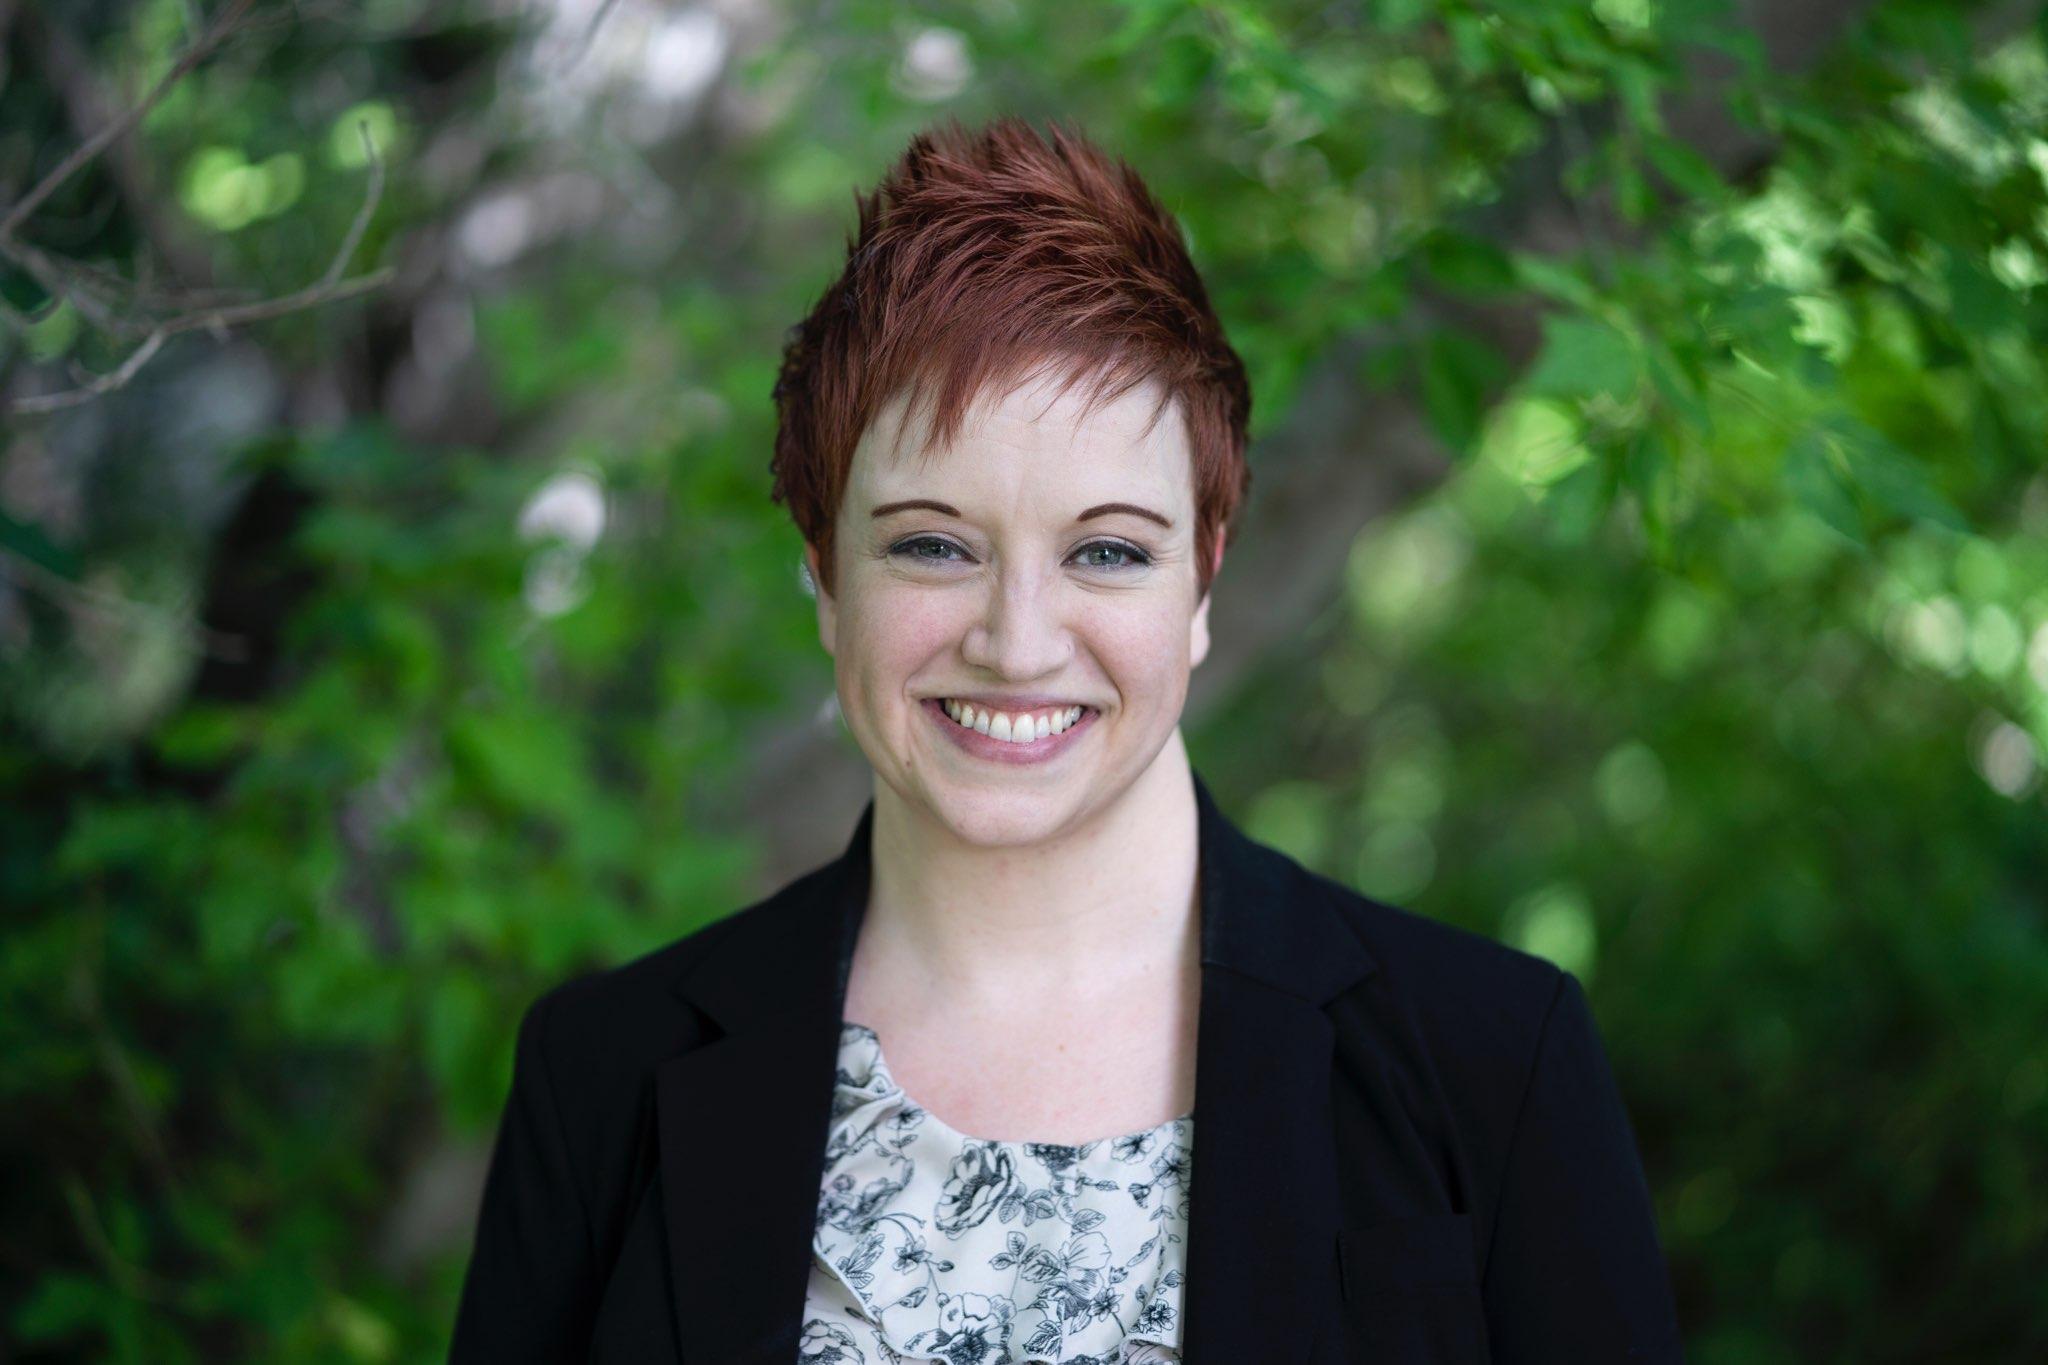 Author Rachel Anne Cox